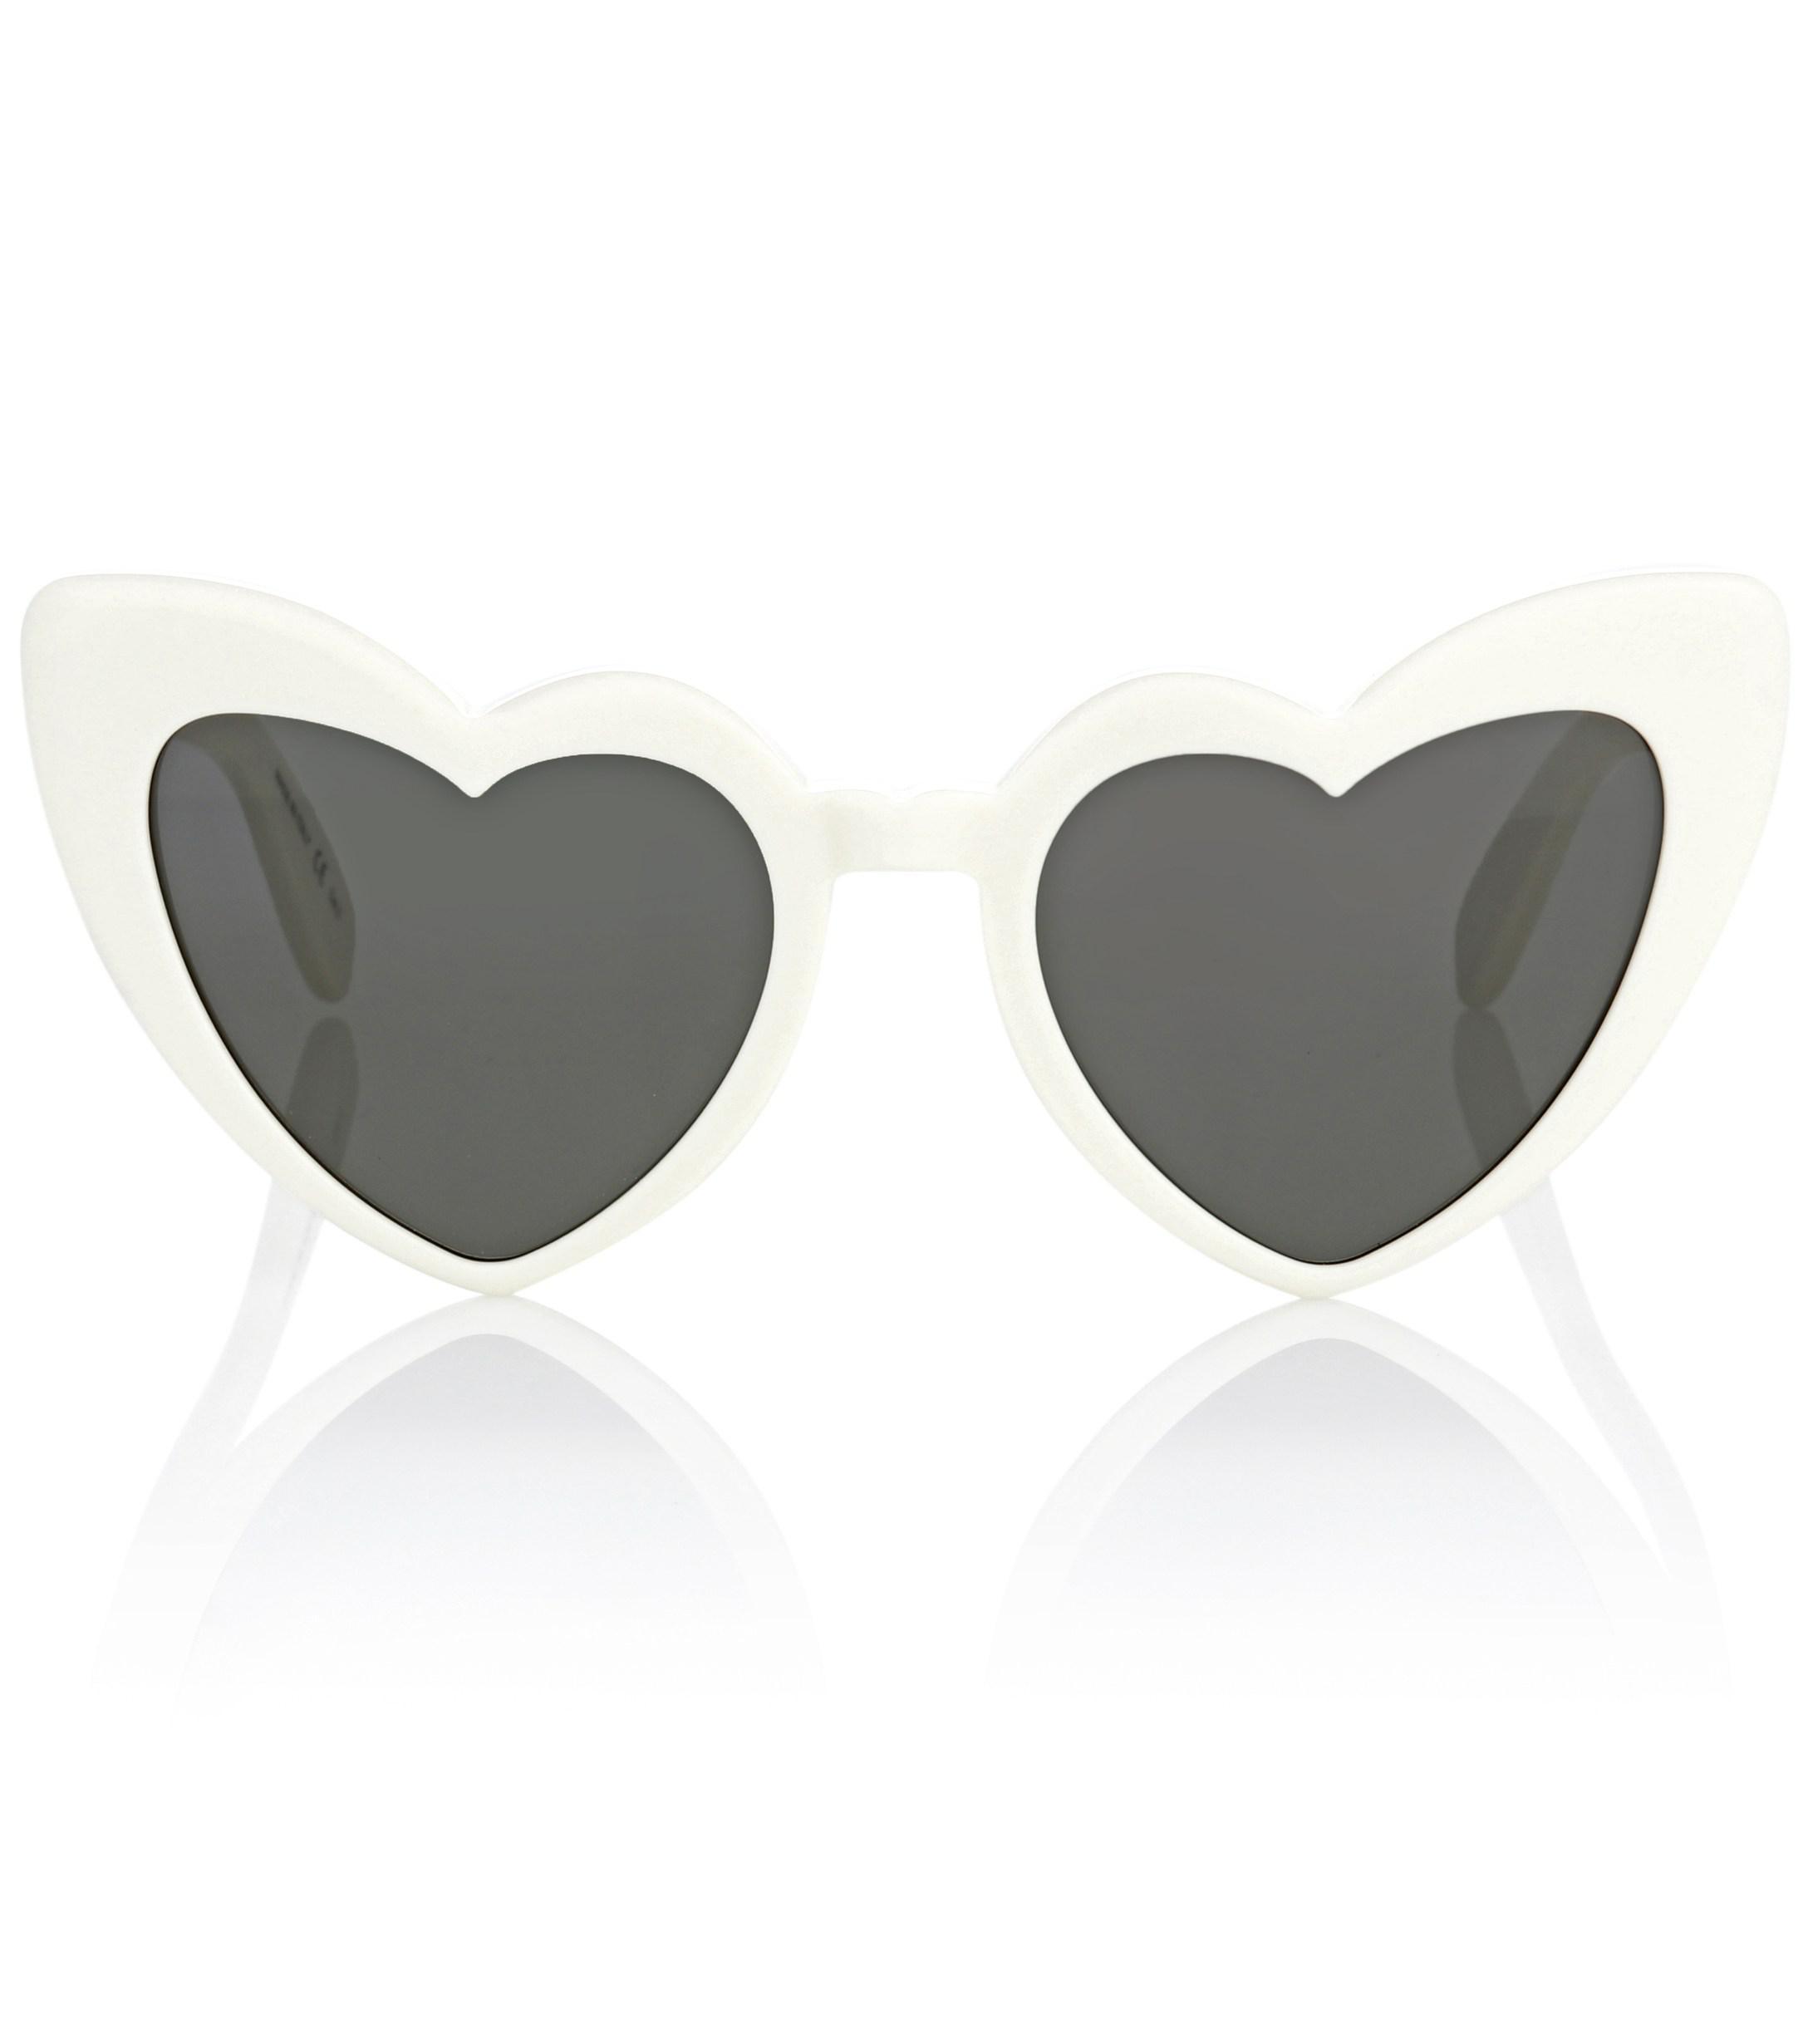 07672485605 Saint Laurent Heart-shaped Sunglasses in White - Lyst